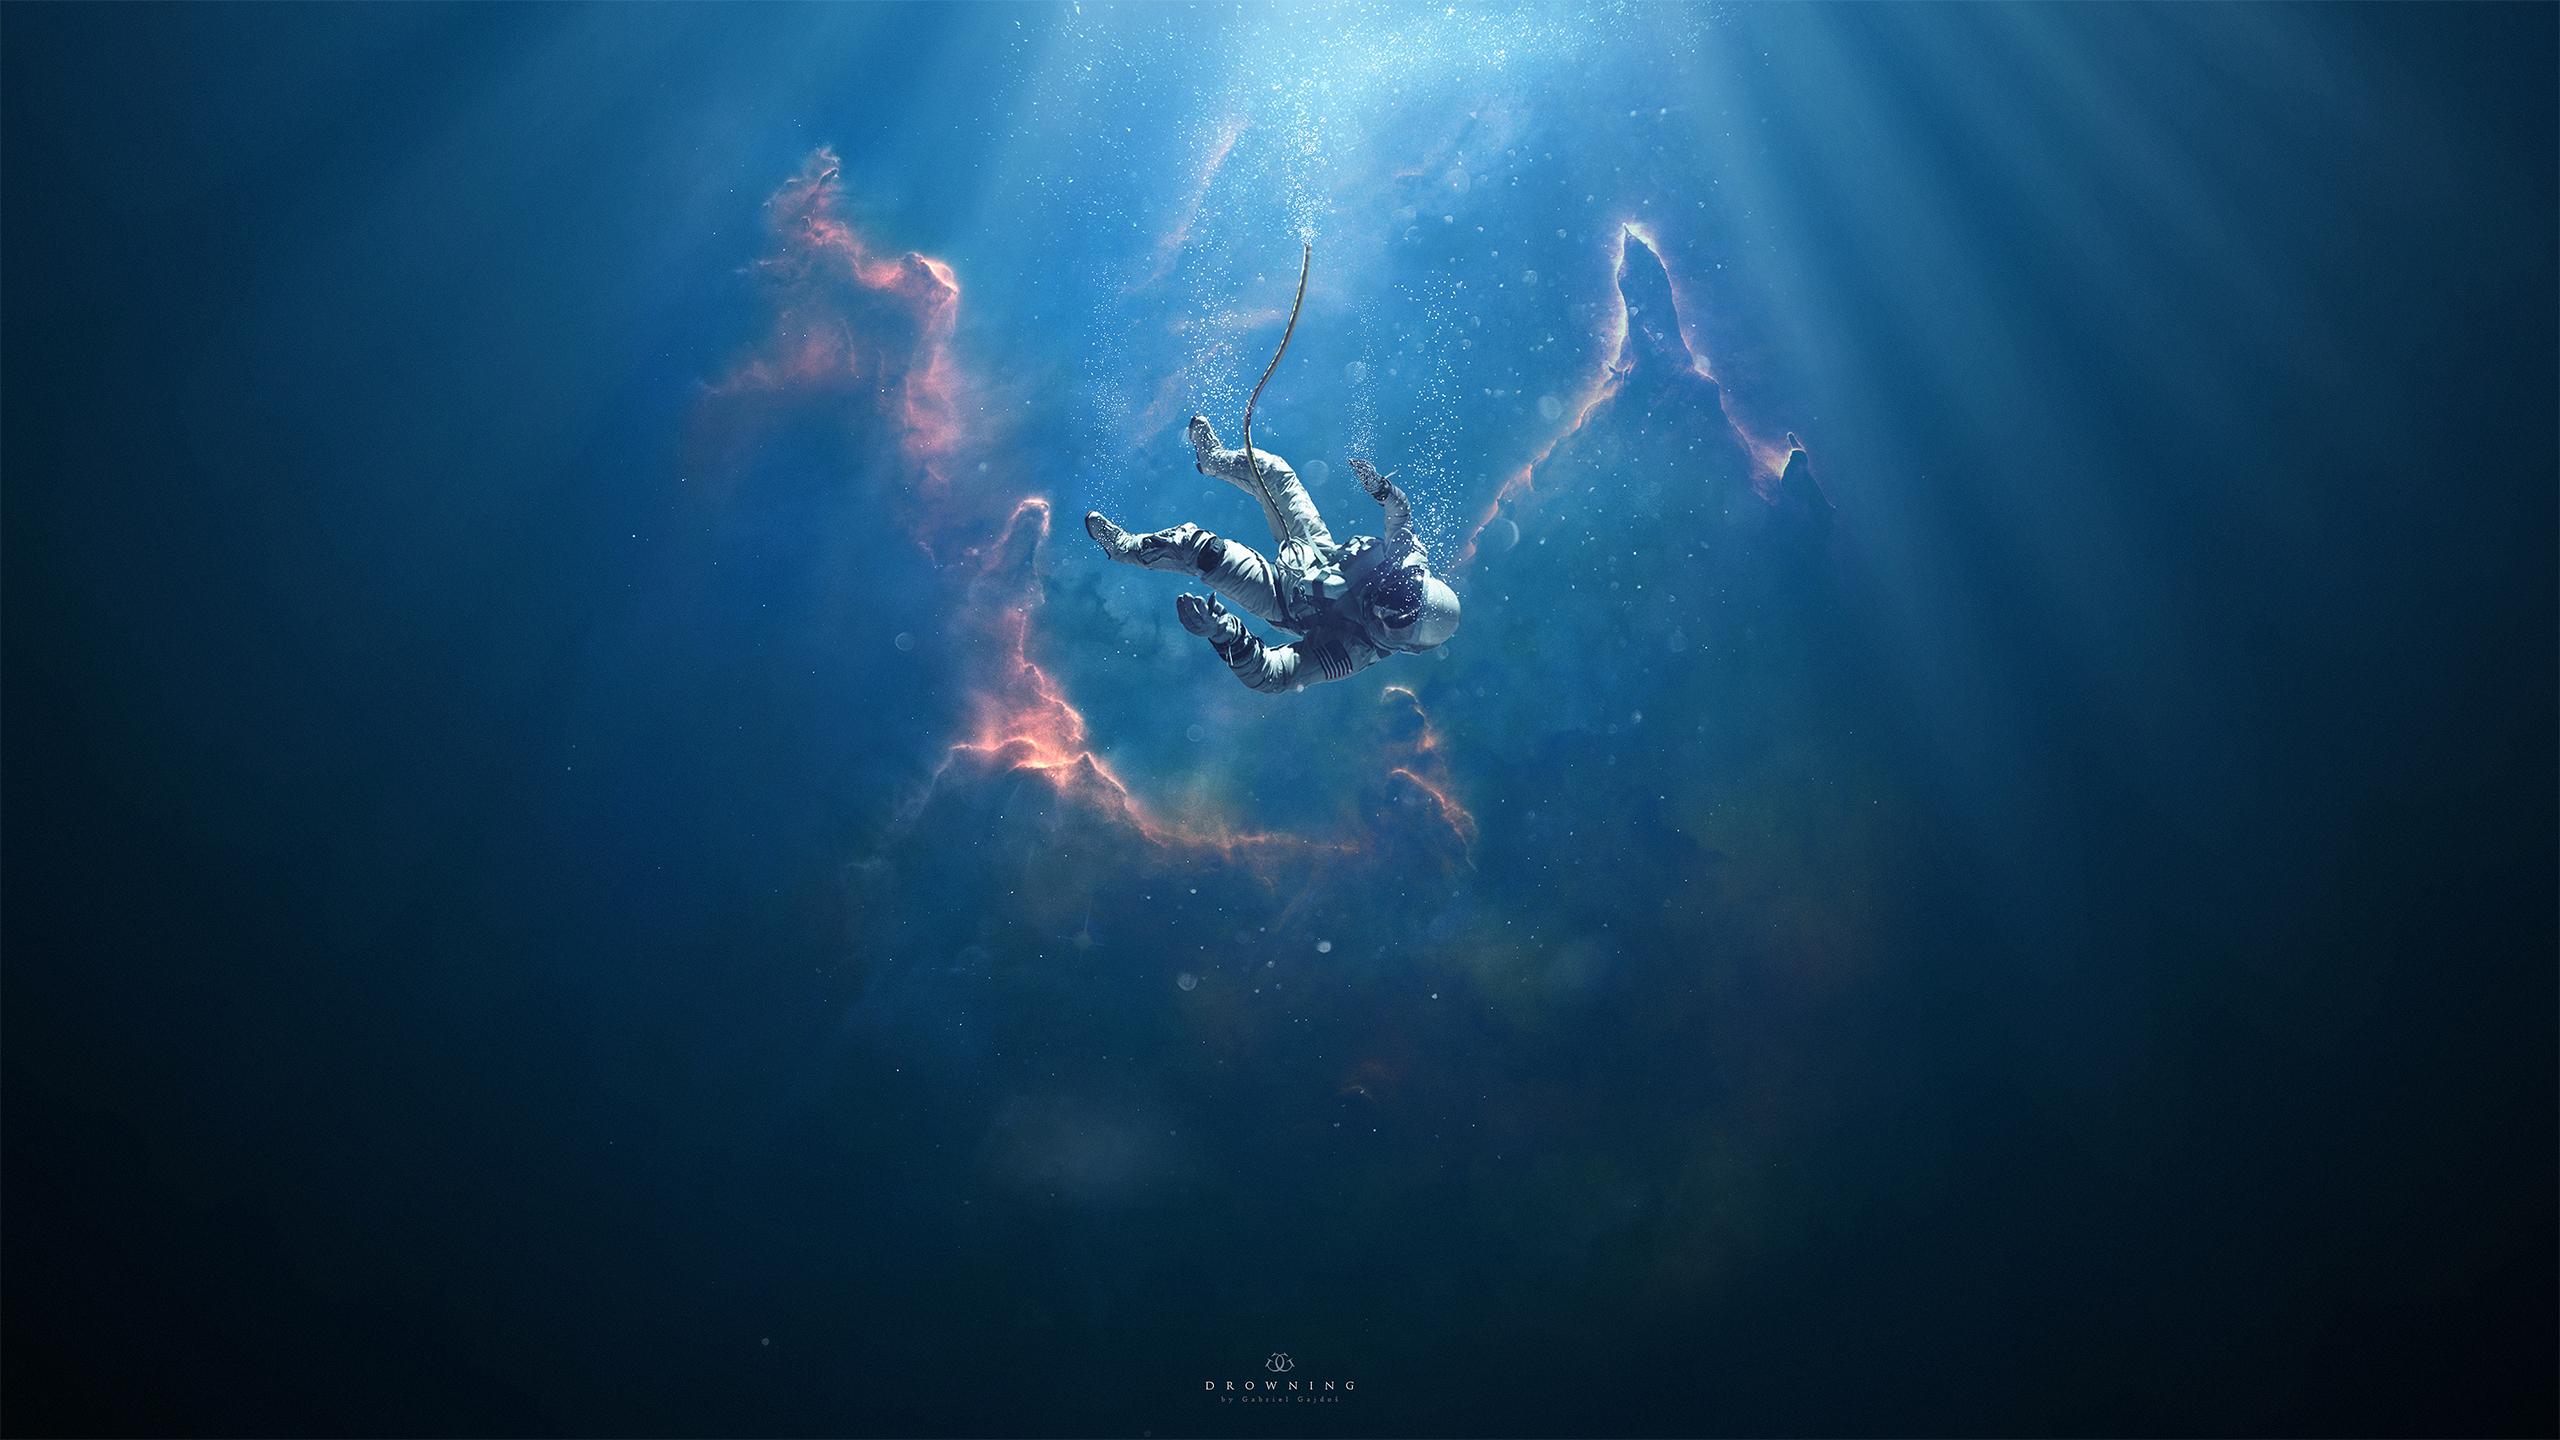 Astronaut Drowning Manipulation Hd Artist 4k Wallpapers